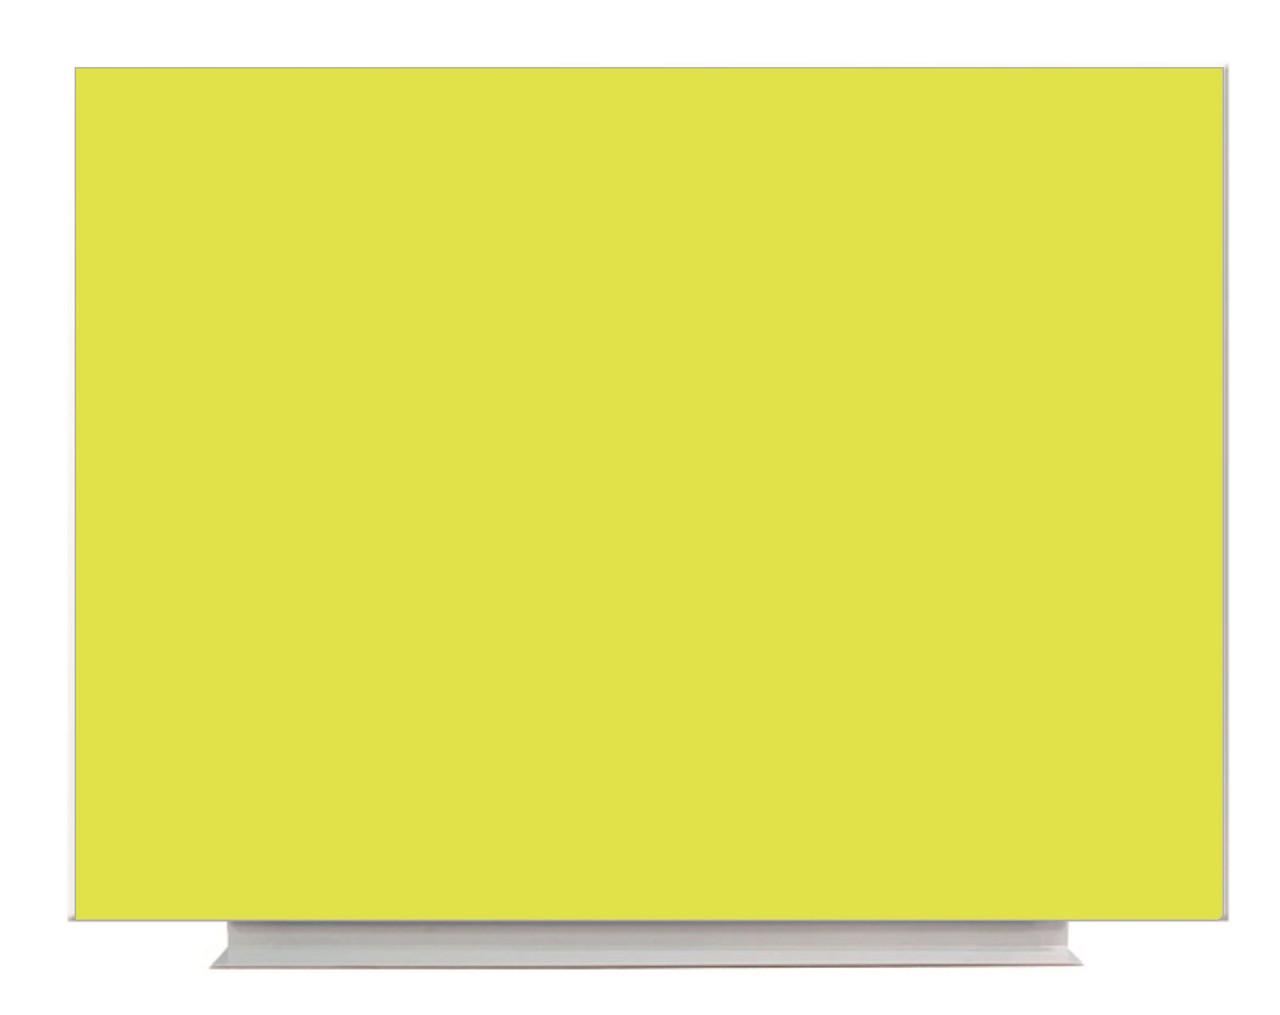 Доска магнитно-маркерная б/р 100x150 Желтый